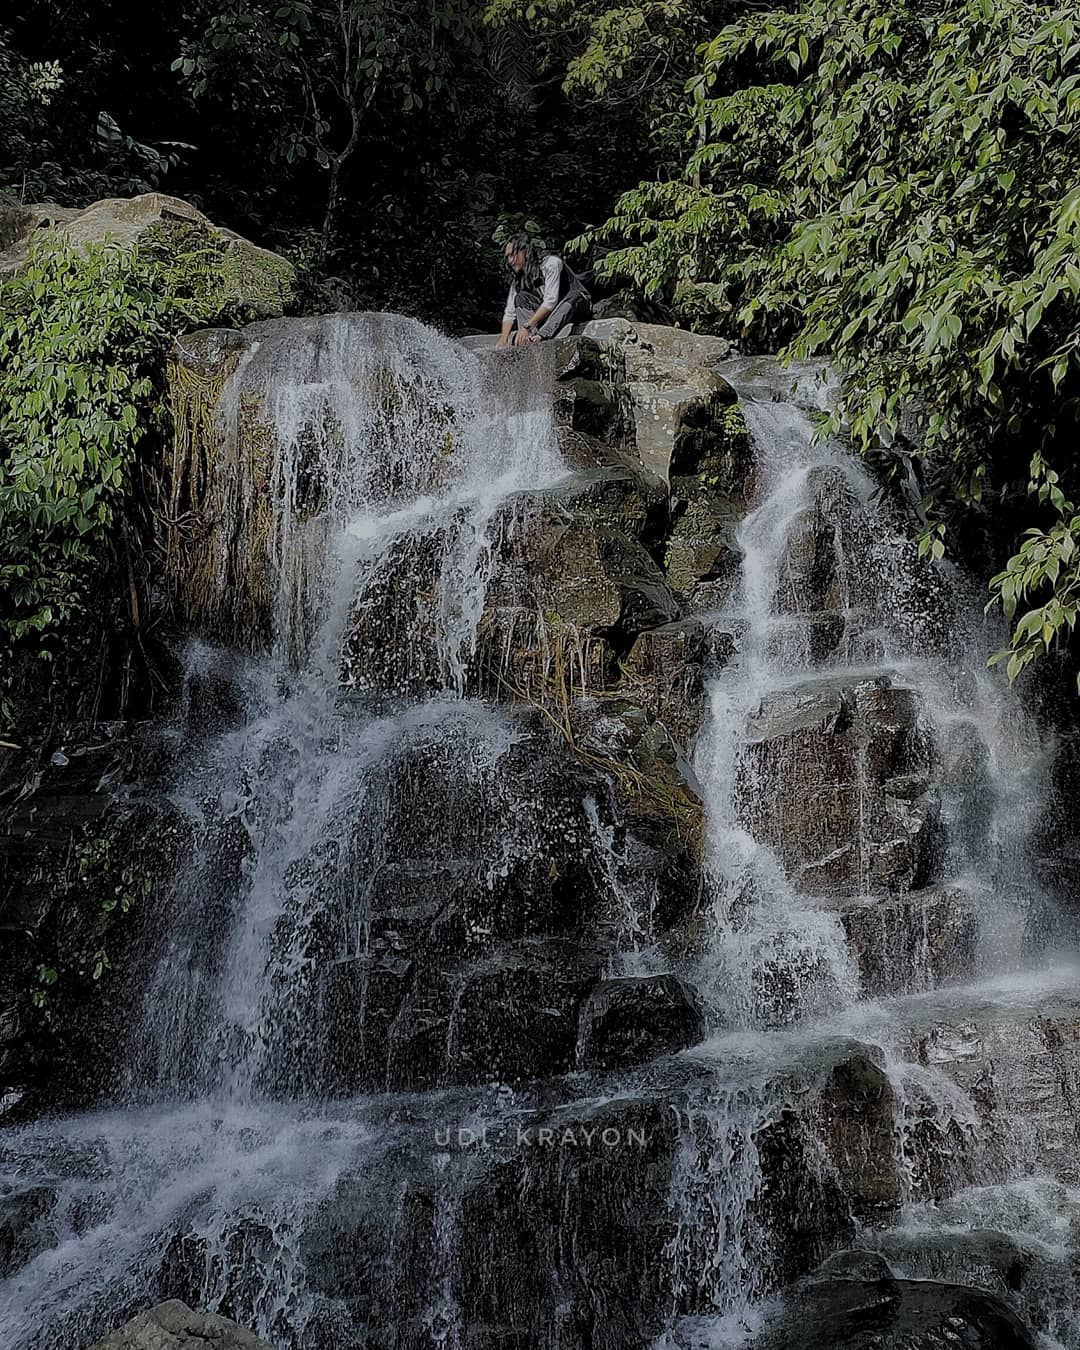 Desa Diminta Ajukan Permohonan Promosi Destinasi Wisata